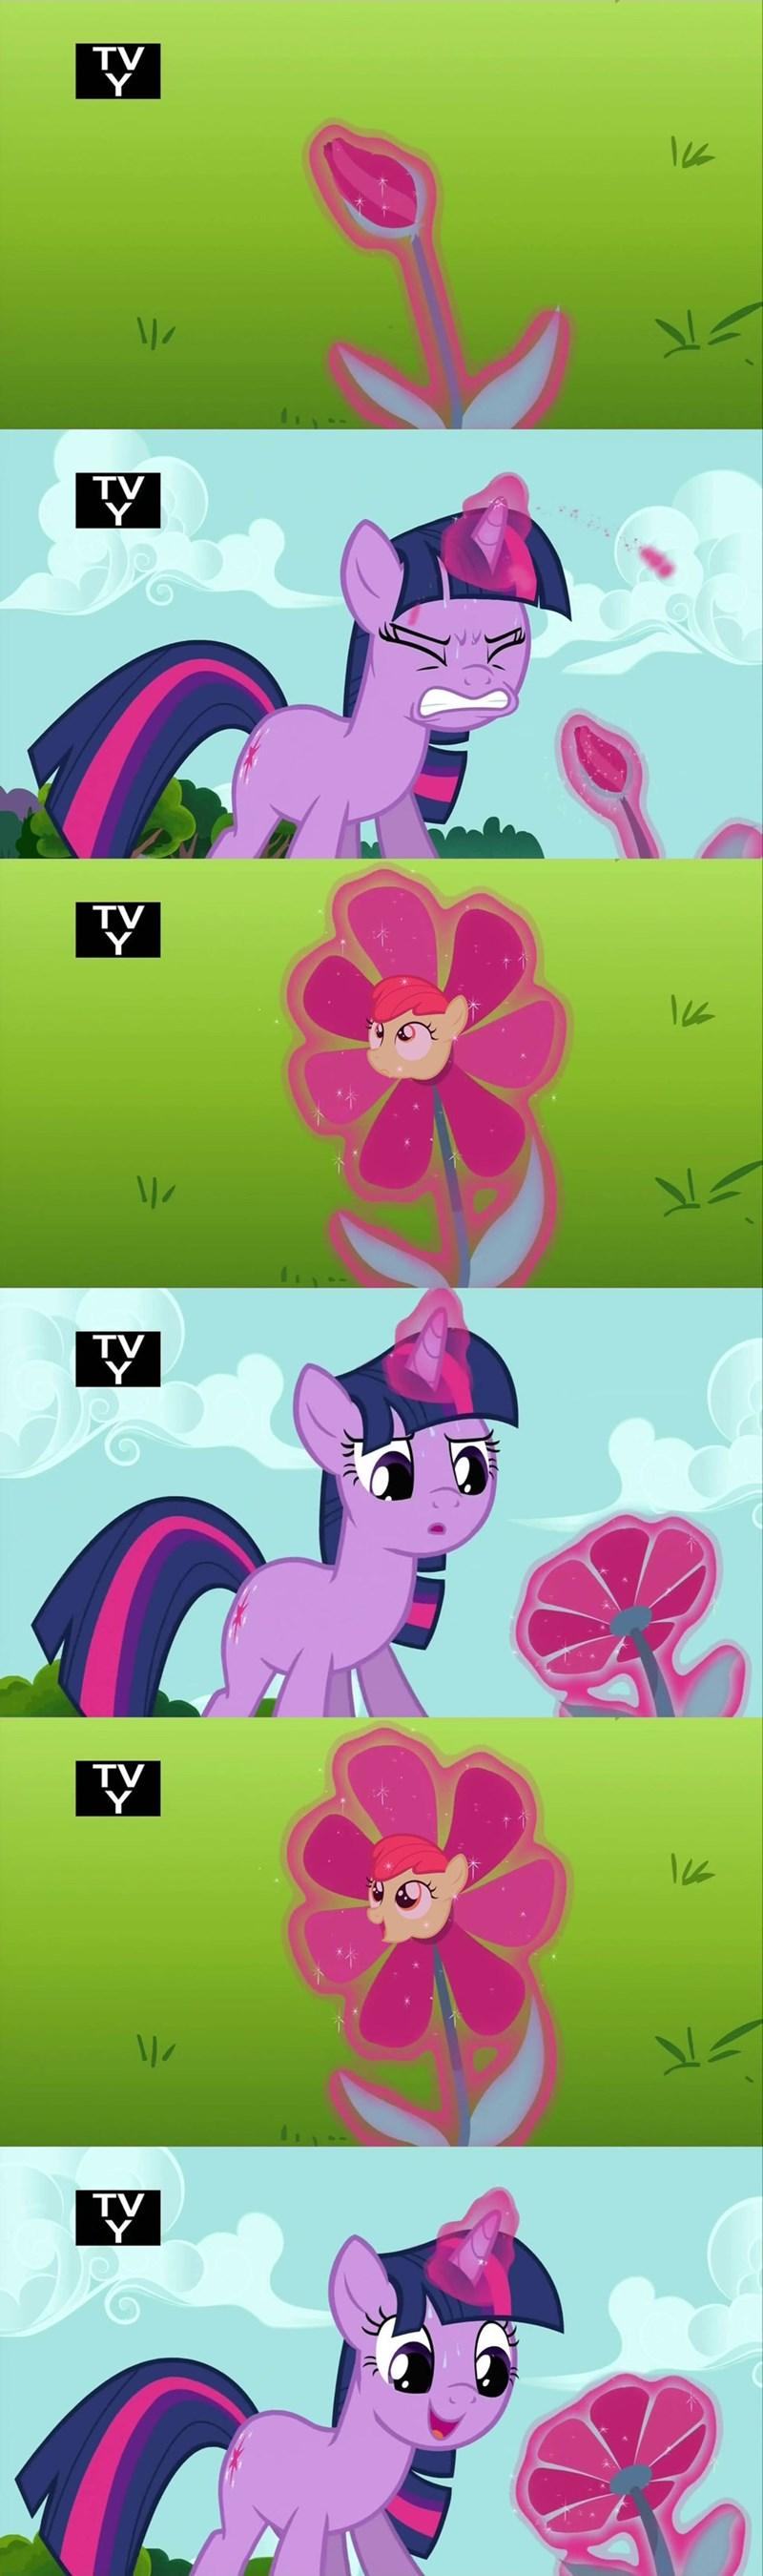 apple bloom comic twilight sparkle magic duel - 8809280768